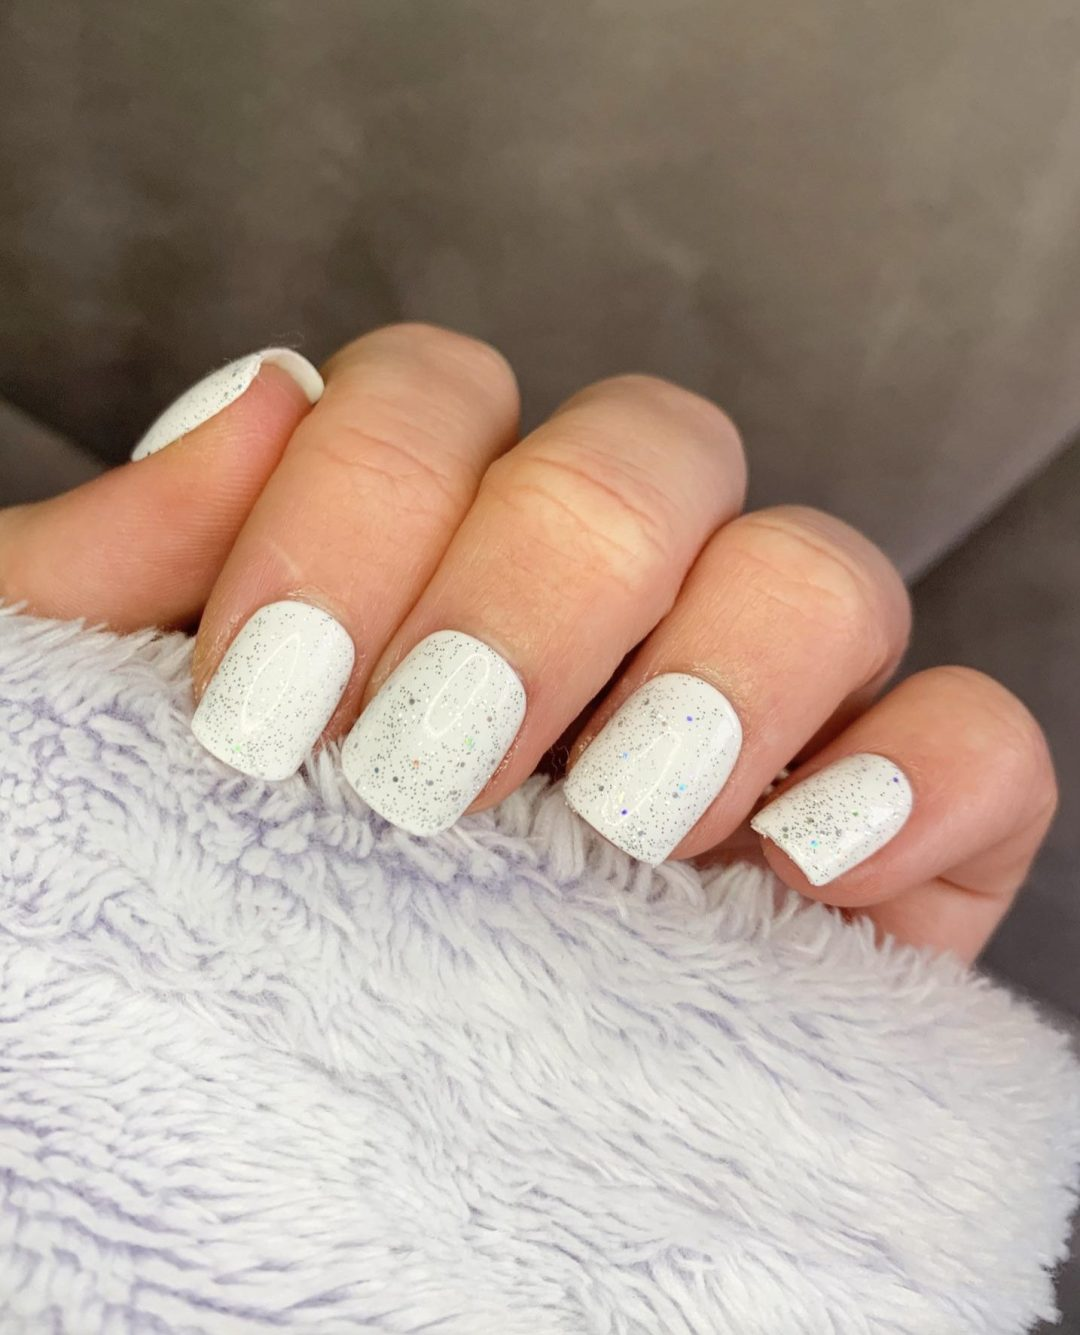 Short white square nails with glitter